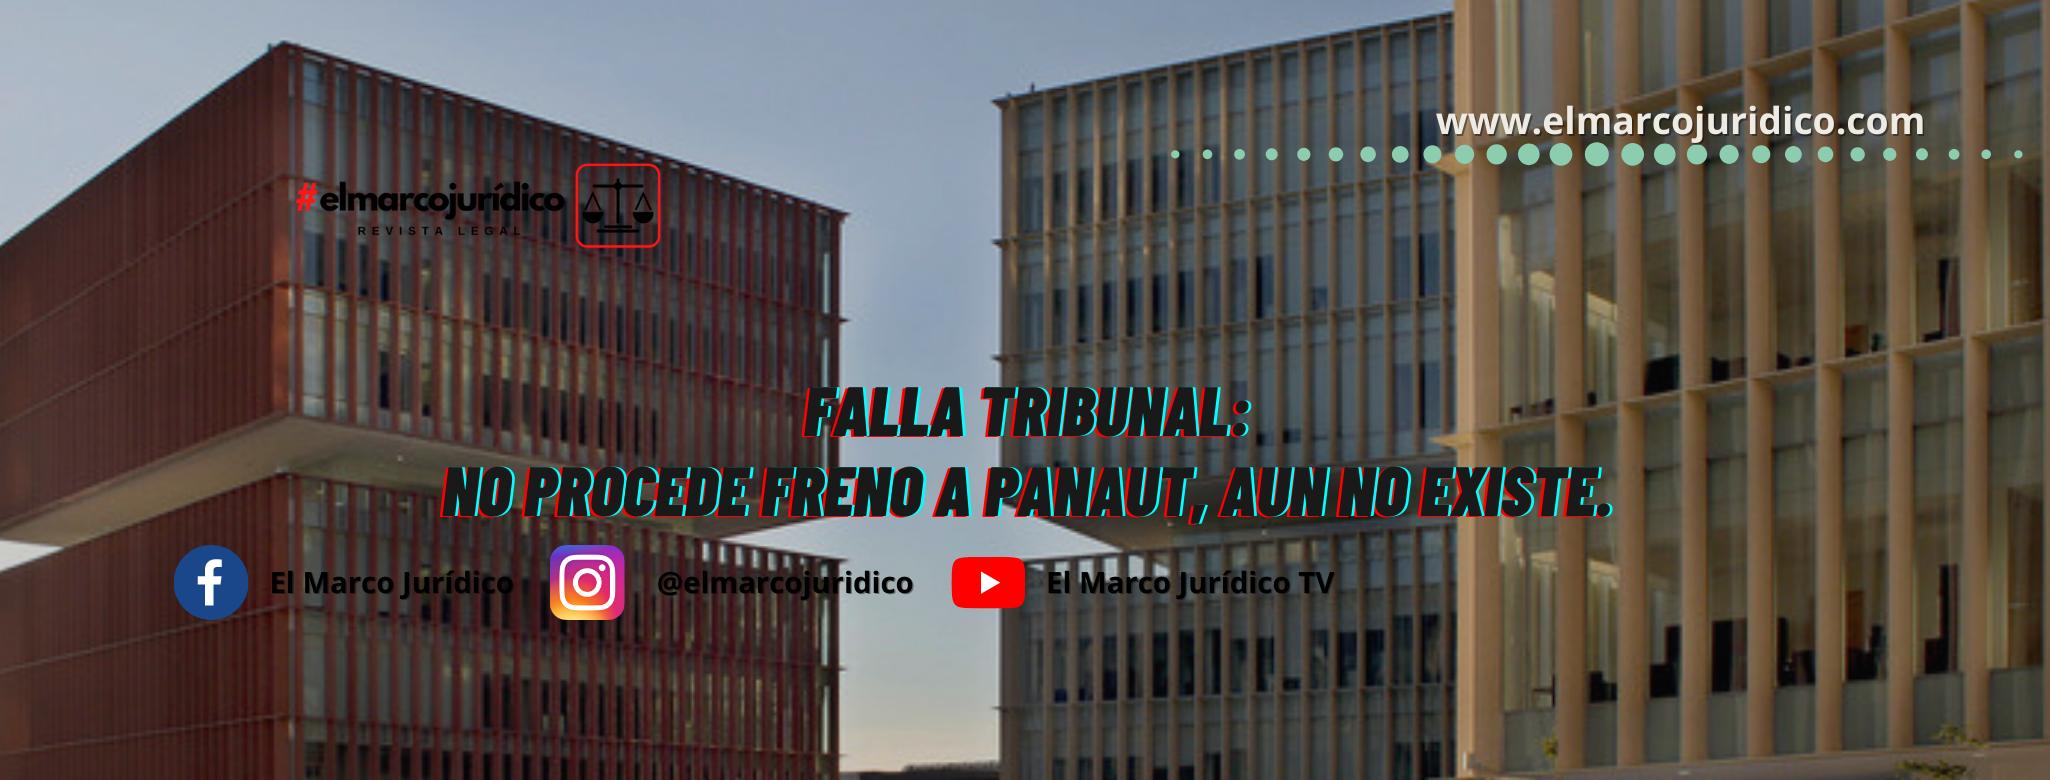 Falla tribunal: no procede freno a Panaut, aún no existe